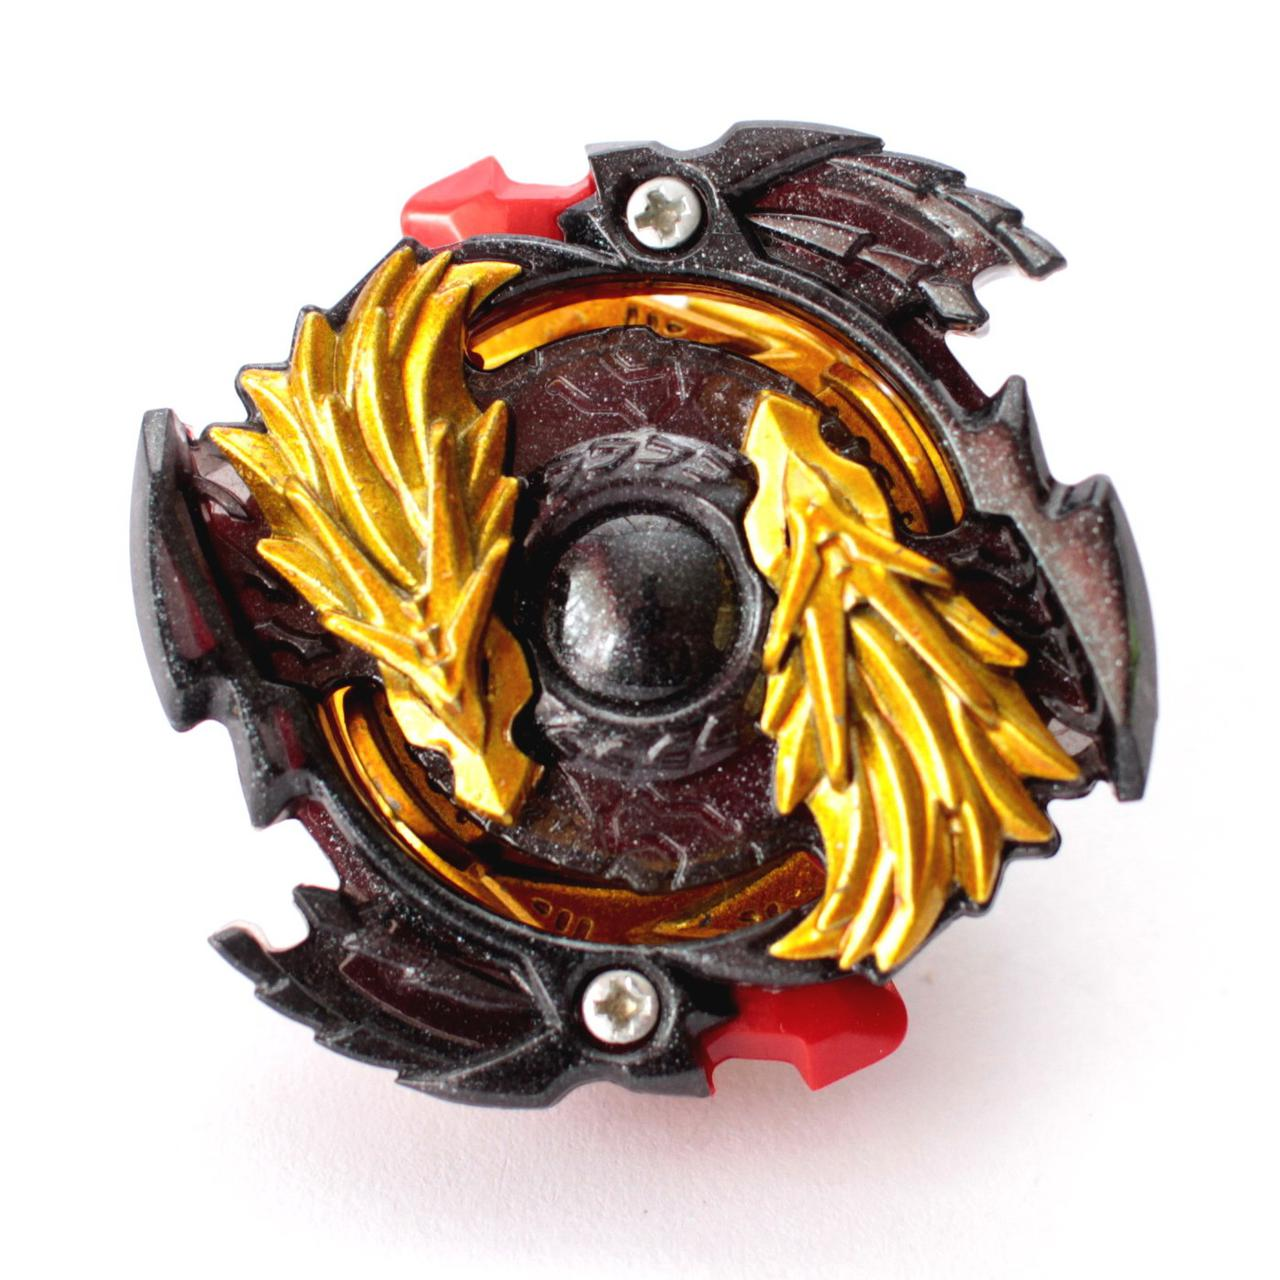 Волчок Бейблэйд Луинор Золотой Дракон (Бейблейд 5 сезон), Beyblade Lost Longinus Gold Dragon (StormGyro, SB™)